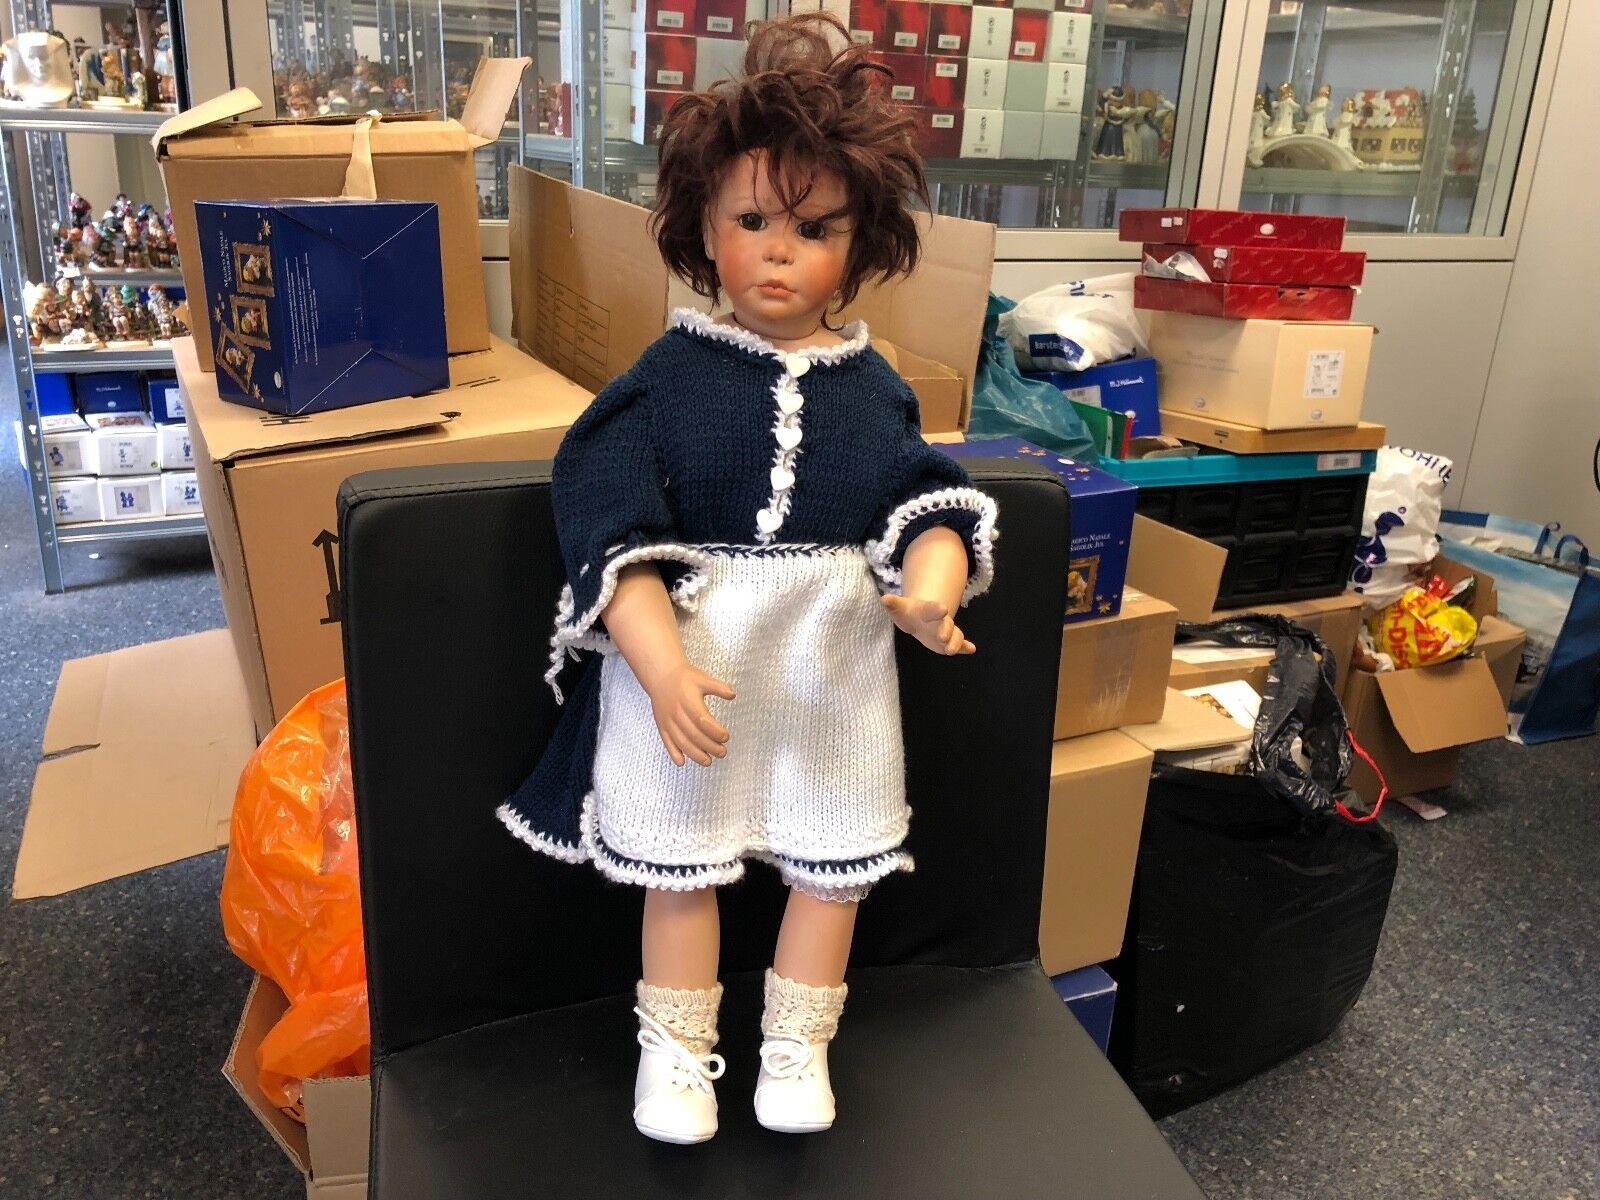 Artistas muñeca muñeca de porcelana 51 cm. top estado